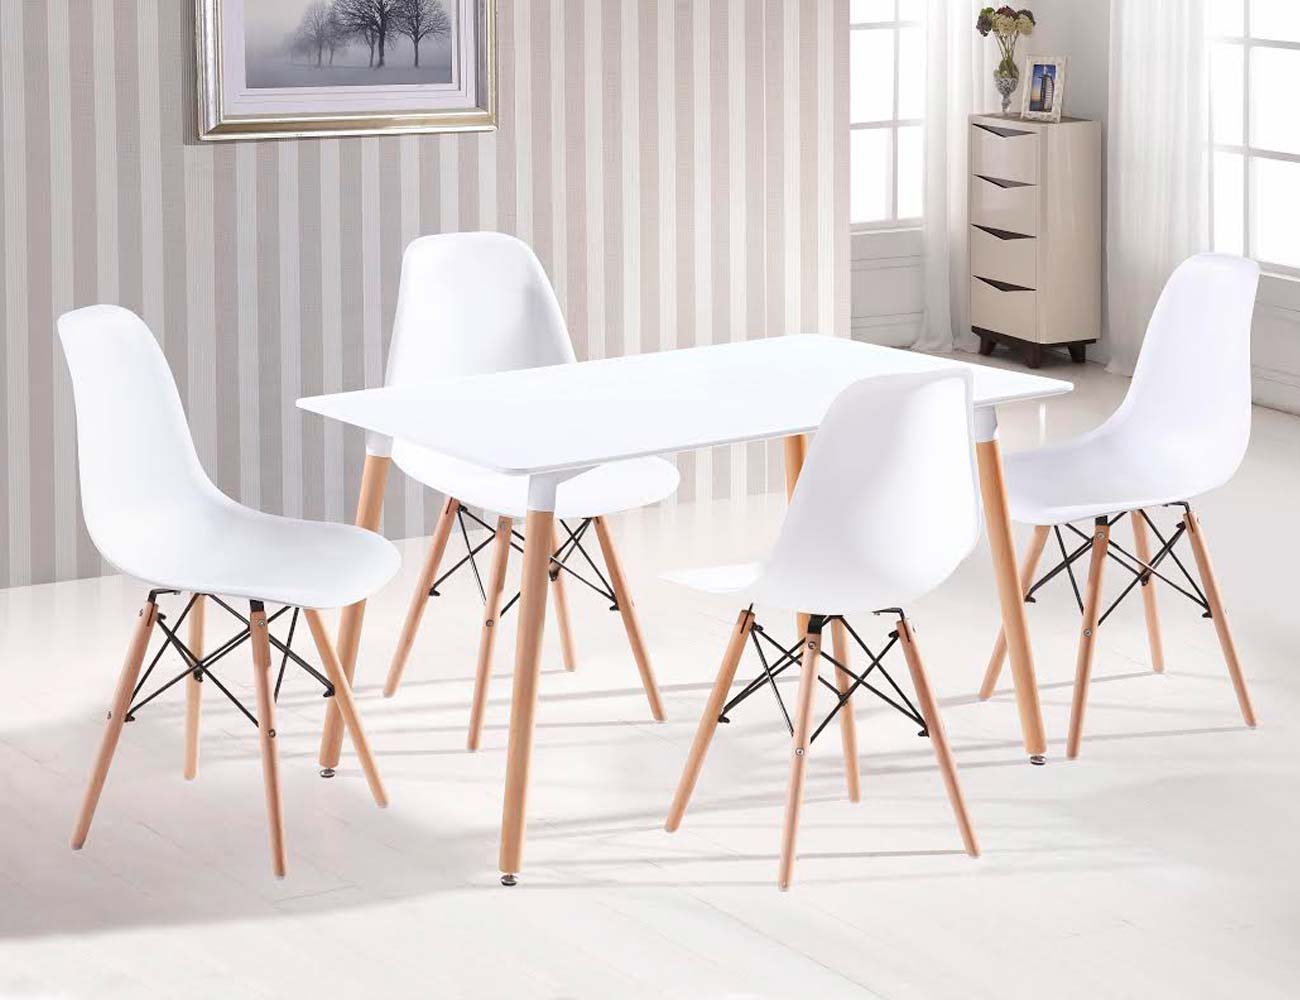 Foto detalle silla asiento resina blanco patas madera